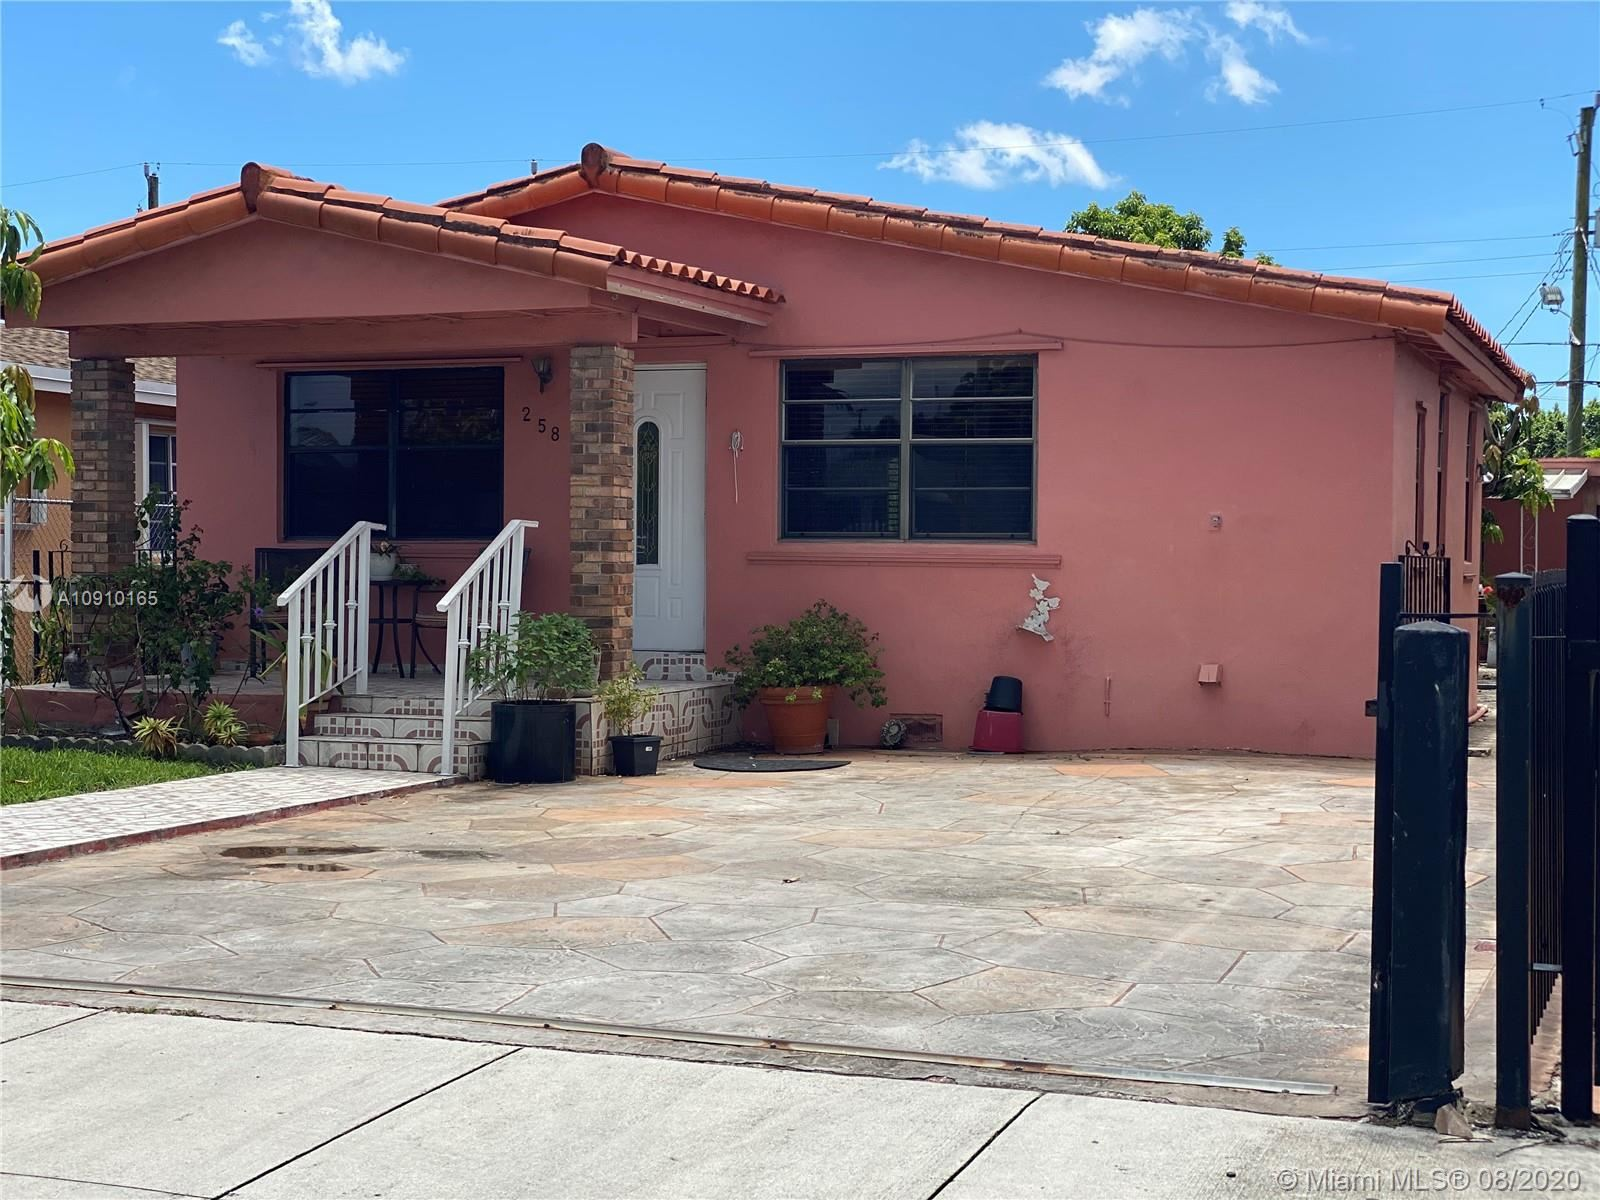 258 W 19th St, Hialeah, FL 33010 - #: A10910165